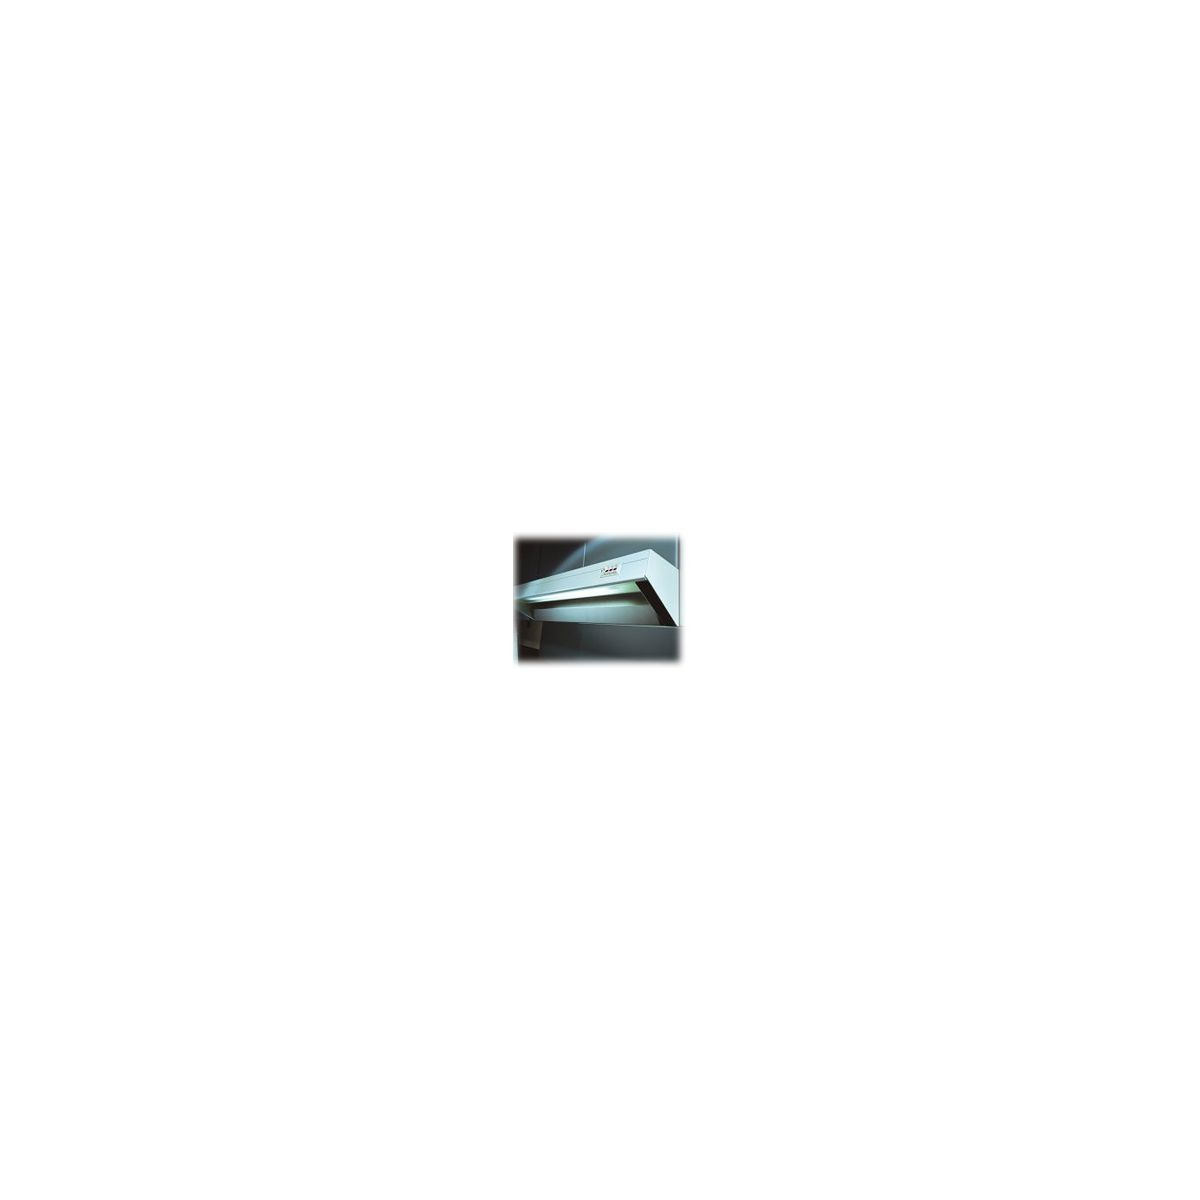 Hotte casquette NOVY D 736 INOX (photo)